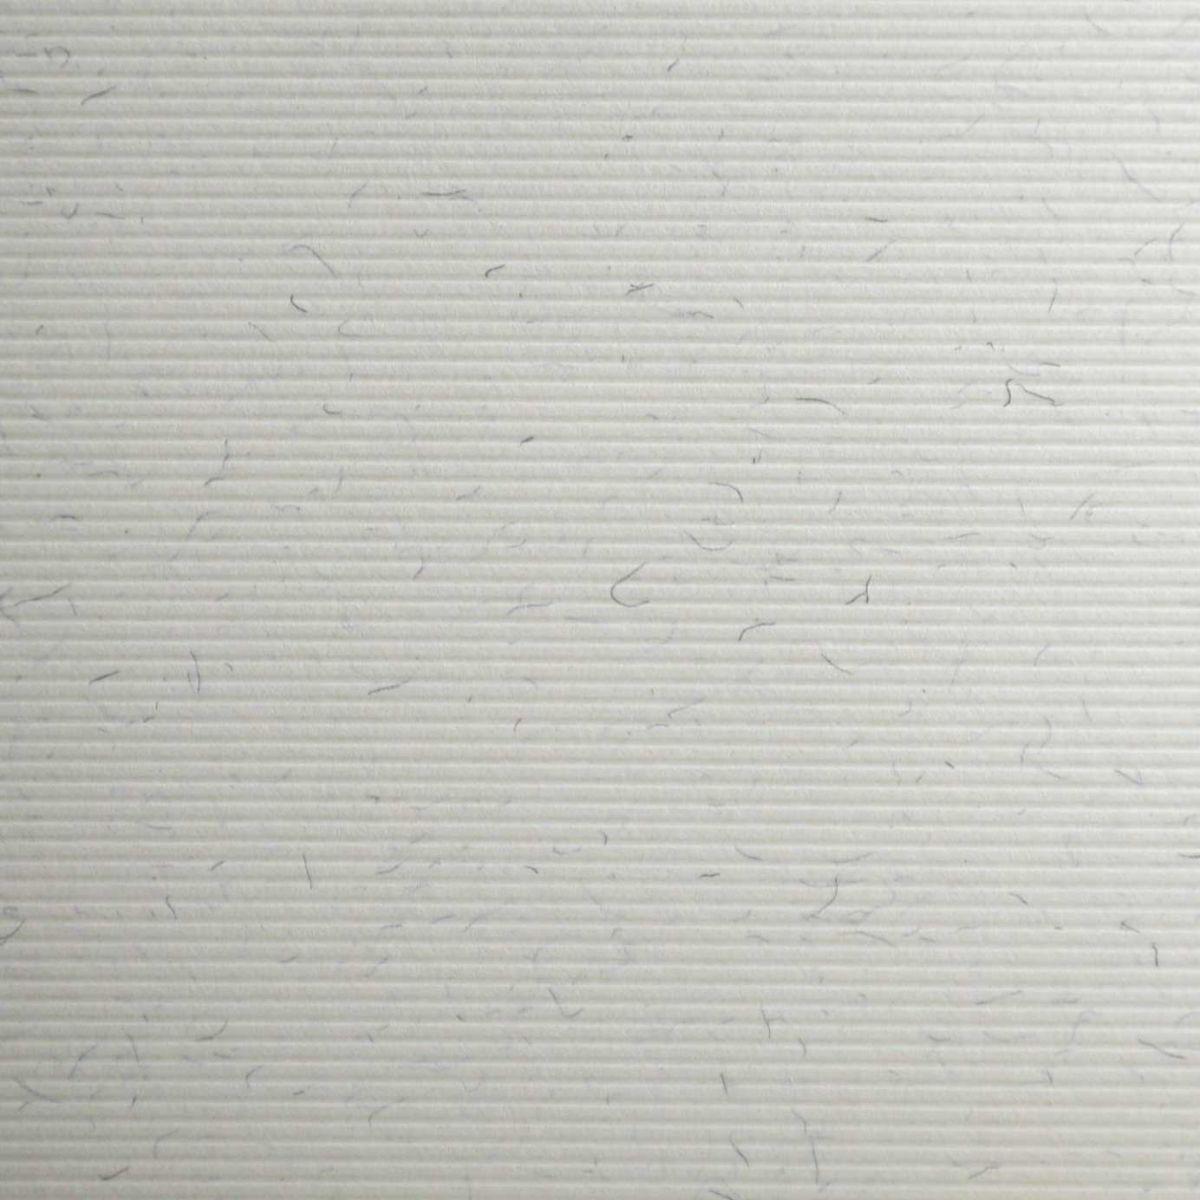 Papel Marrakech TX Pedra-Sabão Microcotelê - 180g